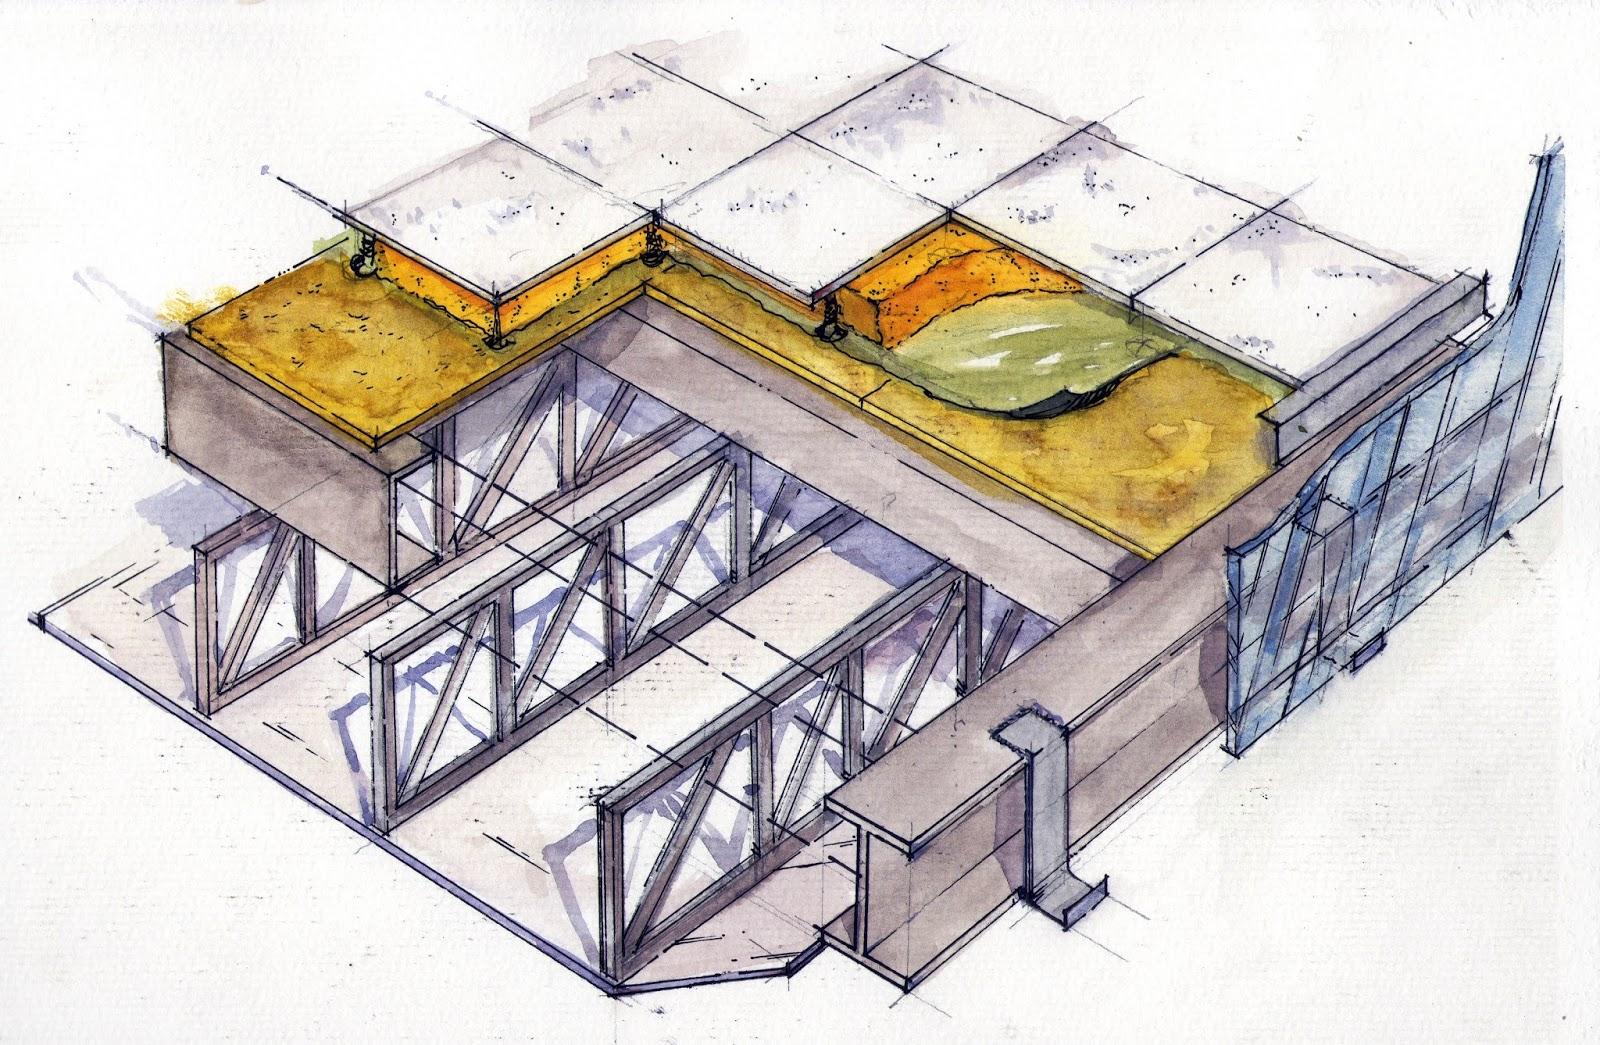 Tp3 construcciones iii grafica arquitectonica for Arquitectura 6b faudi